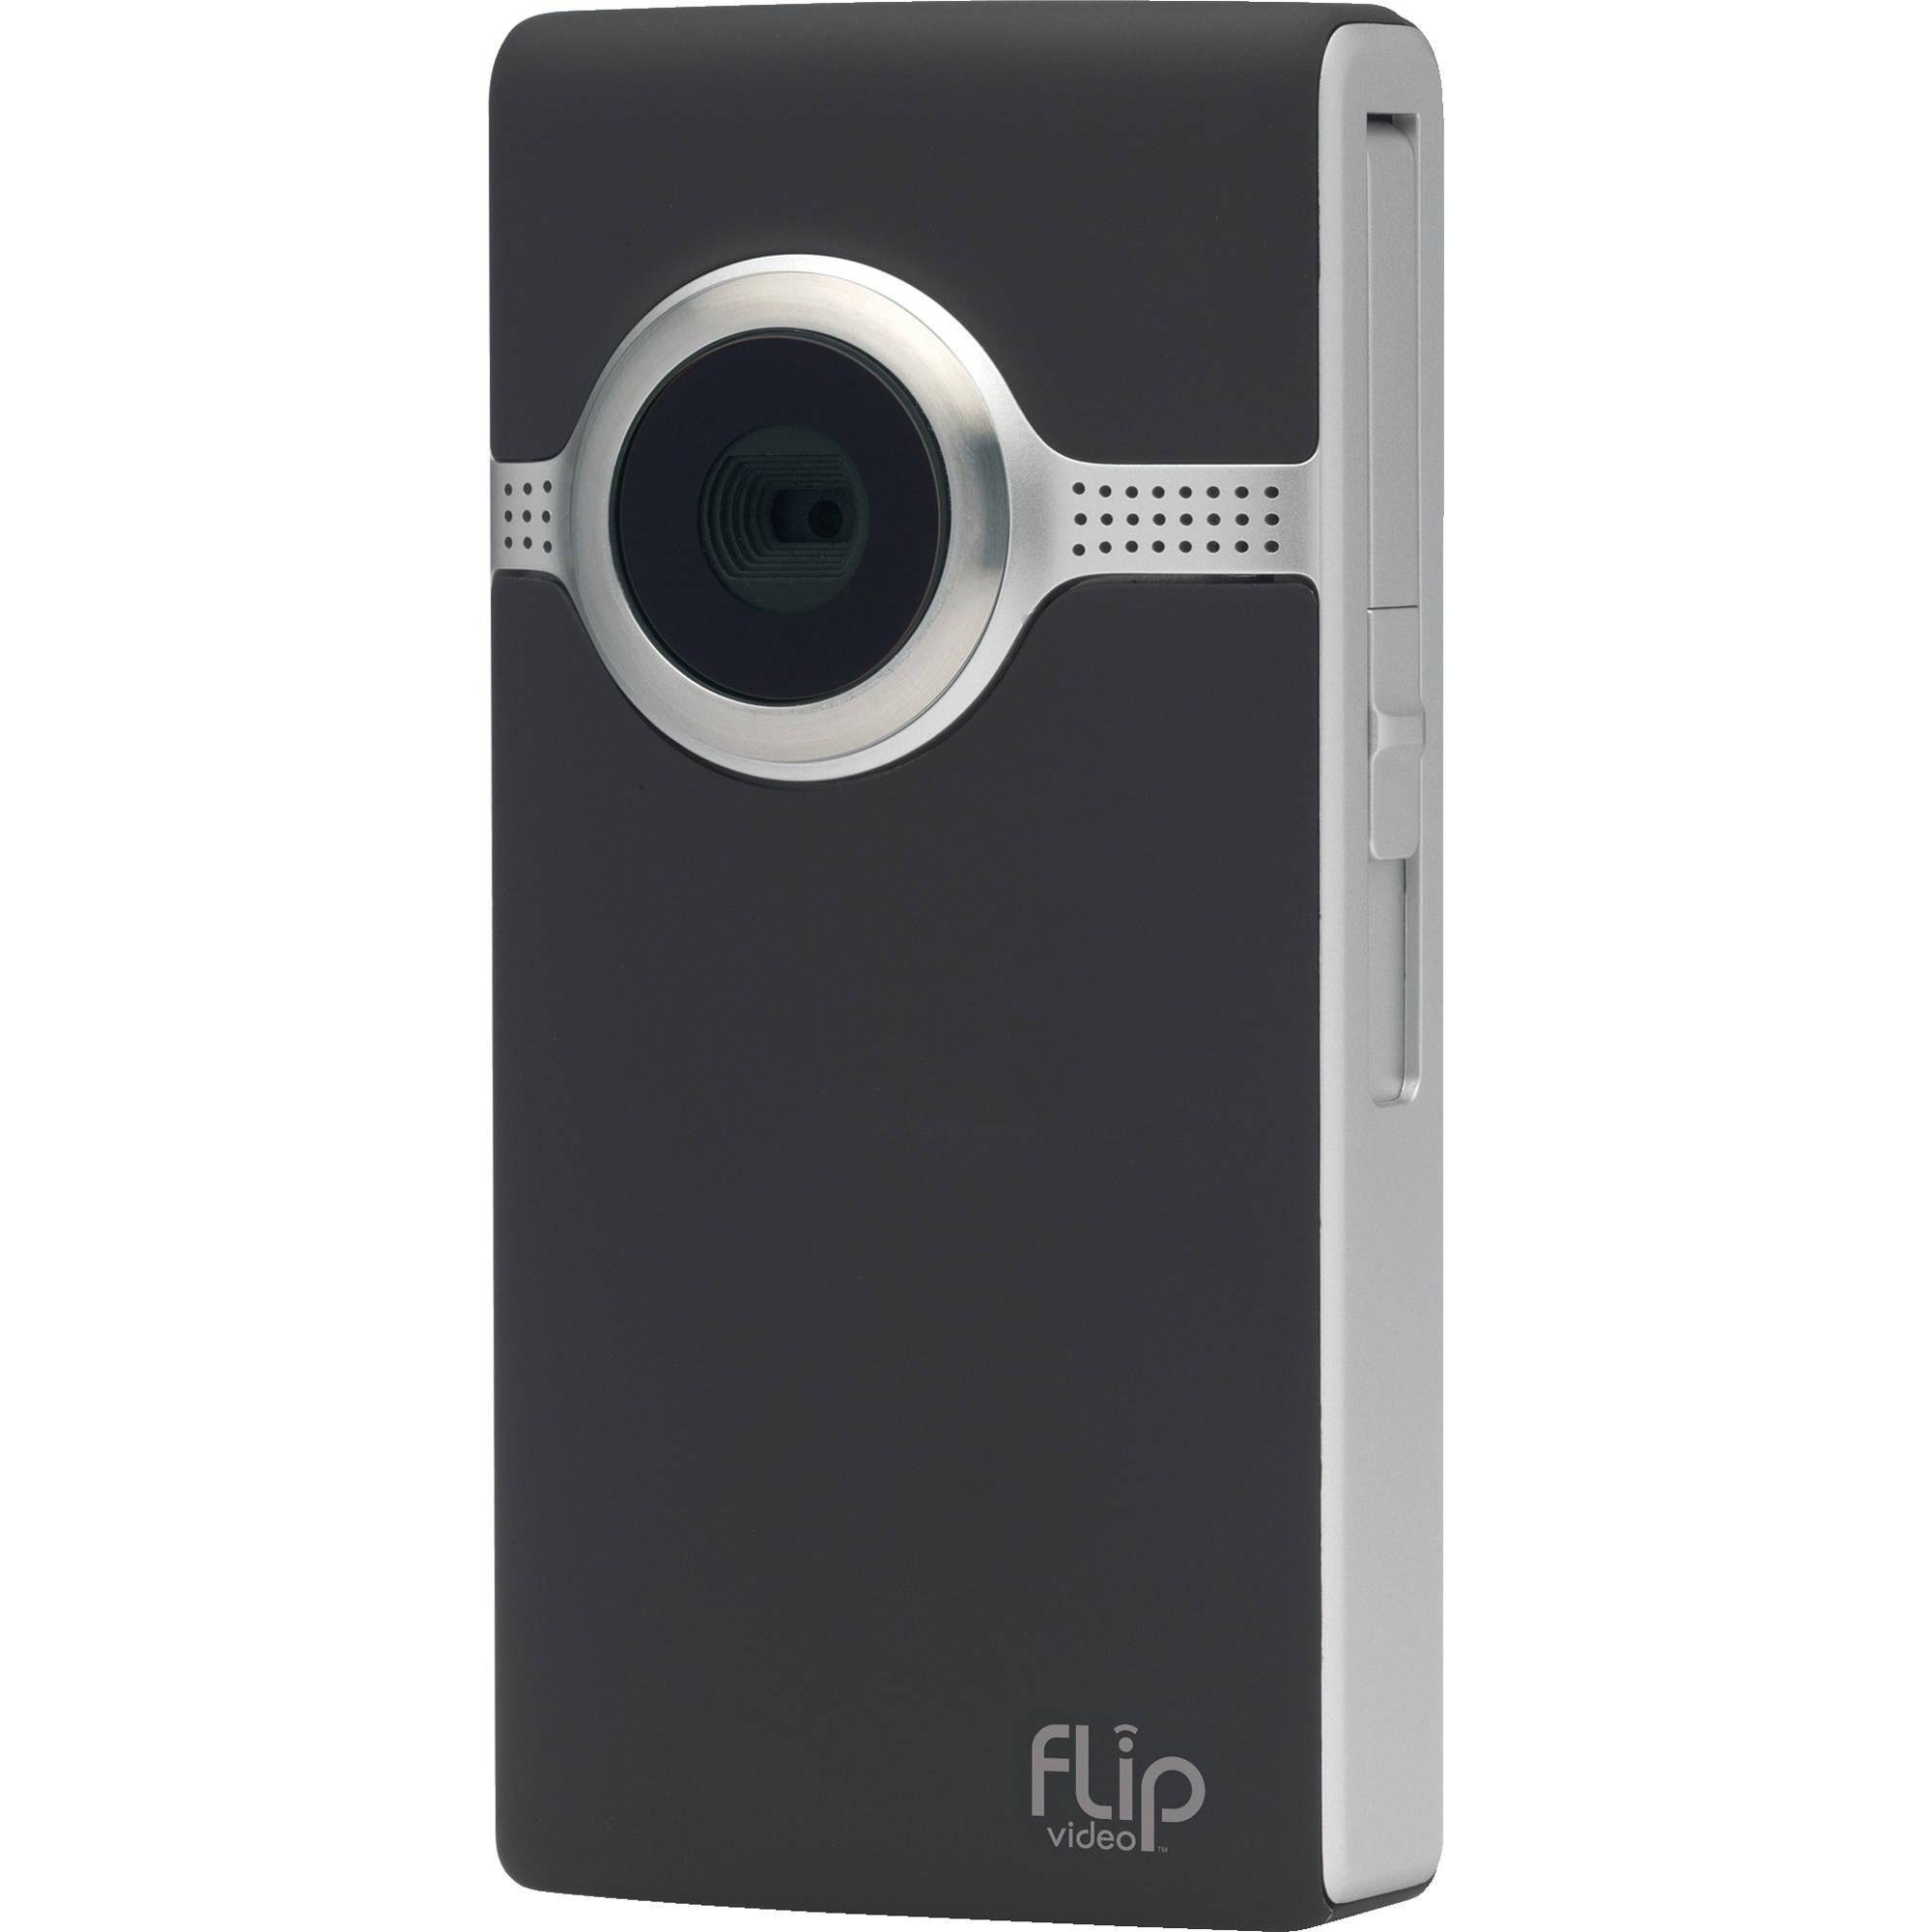 flip video ultrahd video camera black 2 hours u32120b b h rh bhphotovideo com Flip Ultra HD Manual Flip Ultra HD Model U260